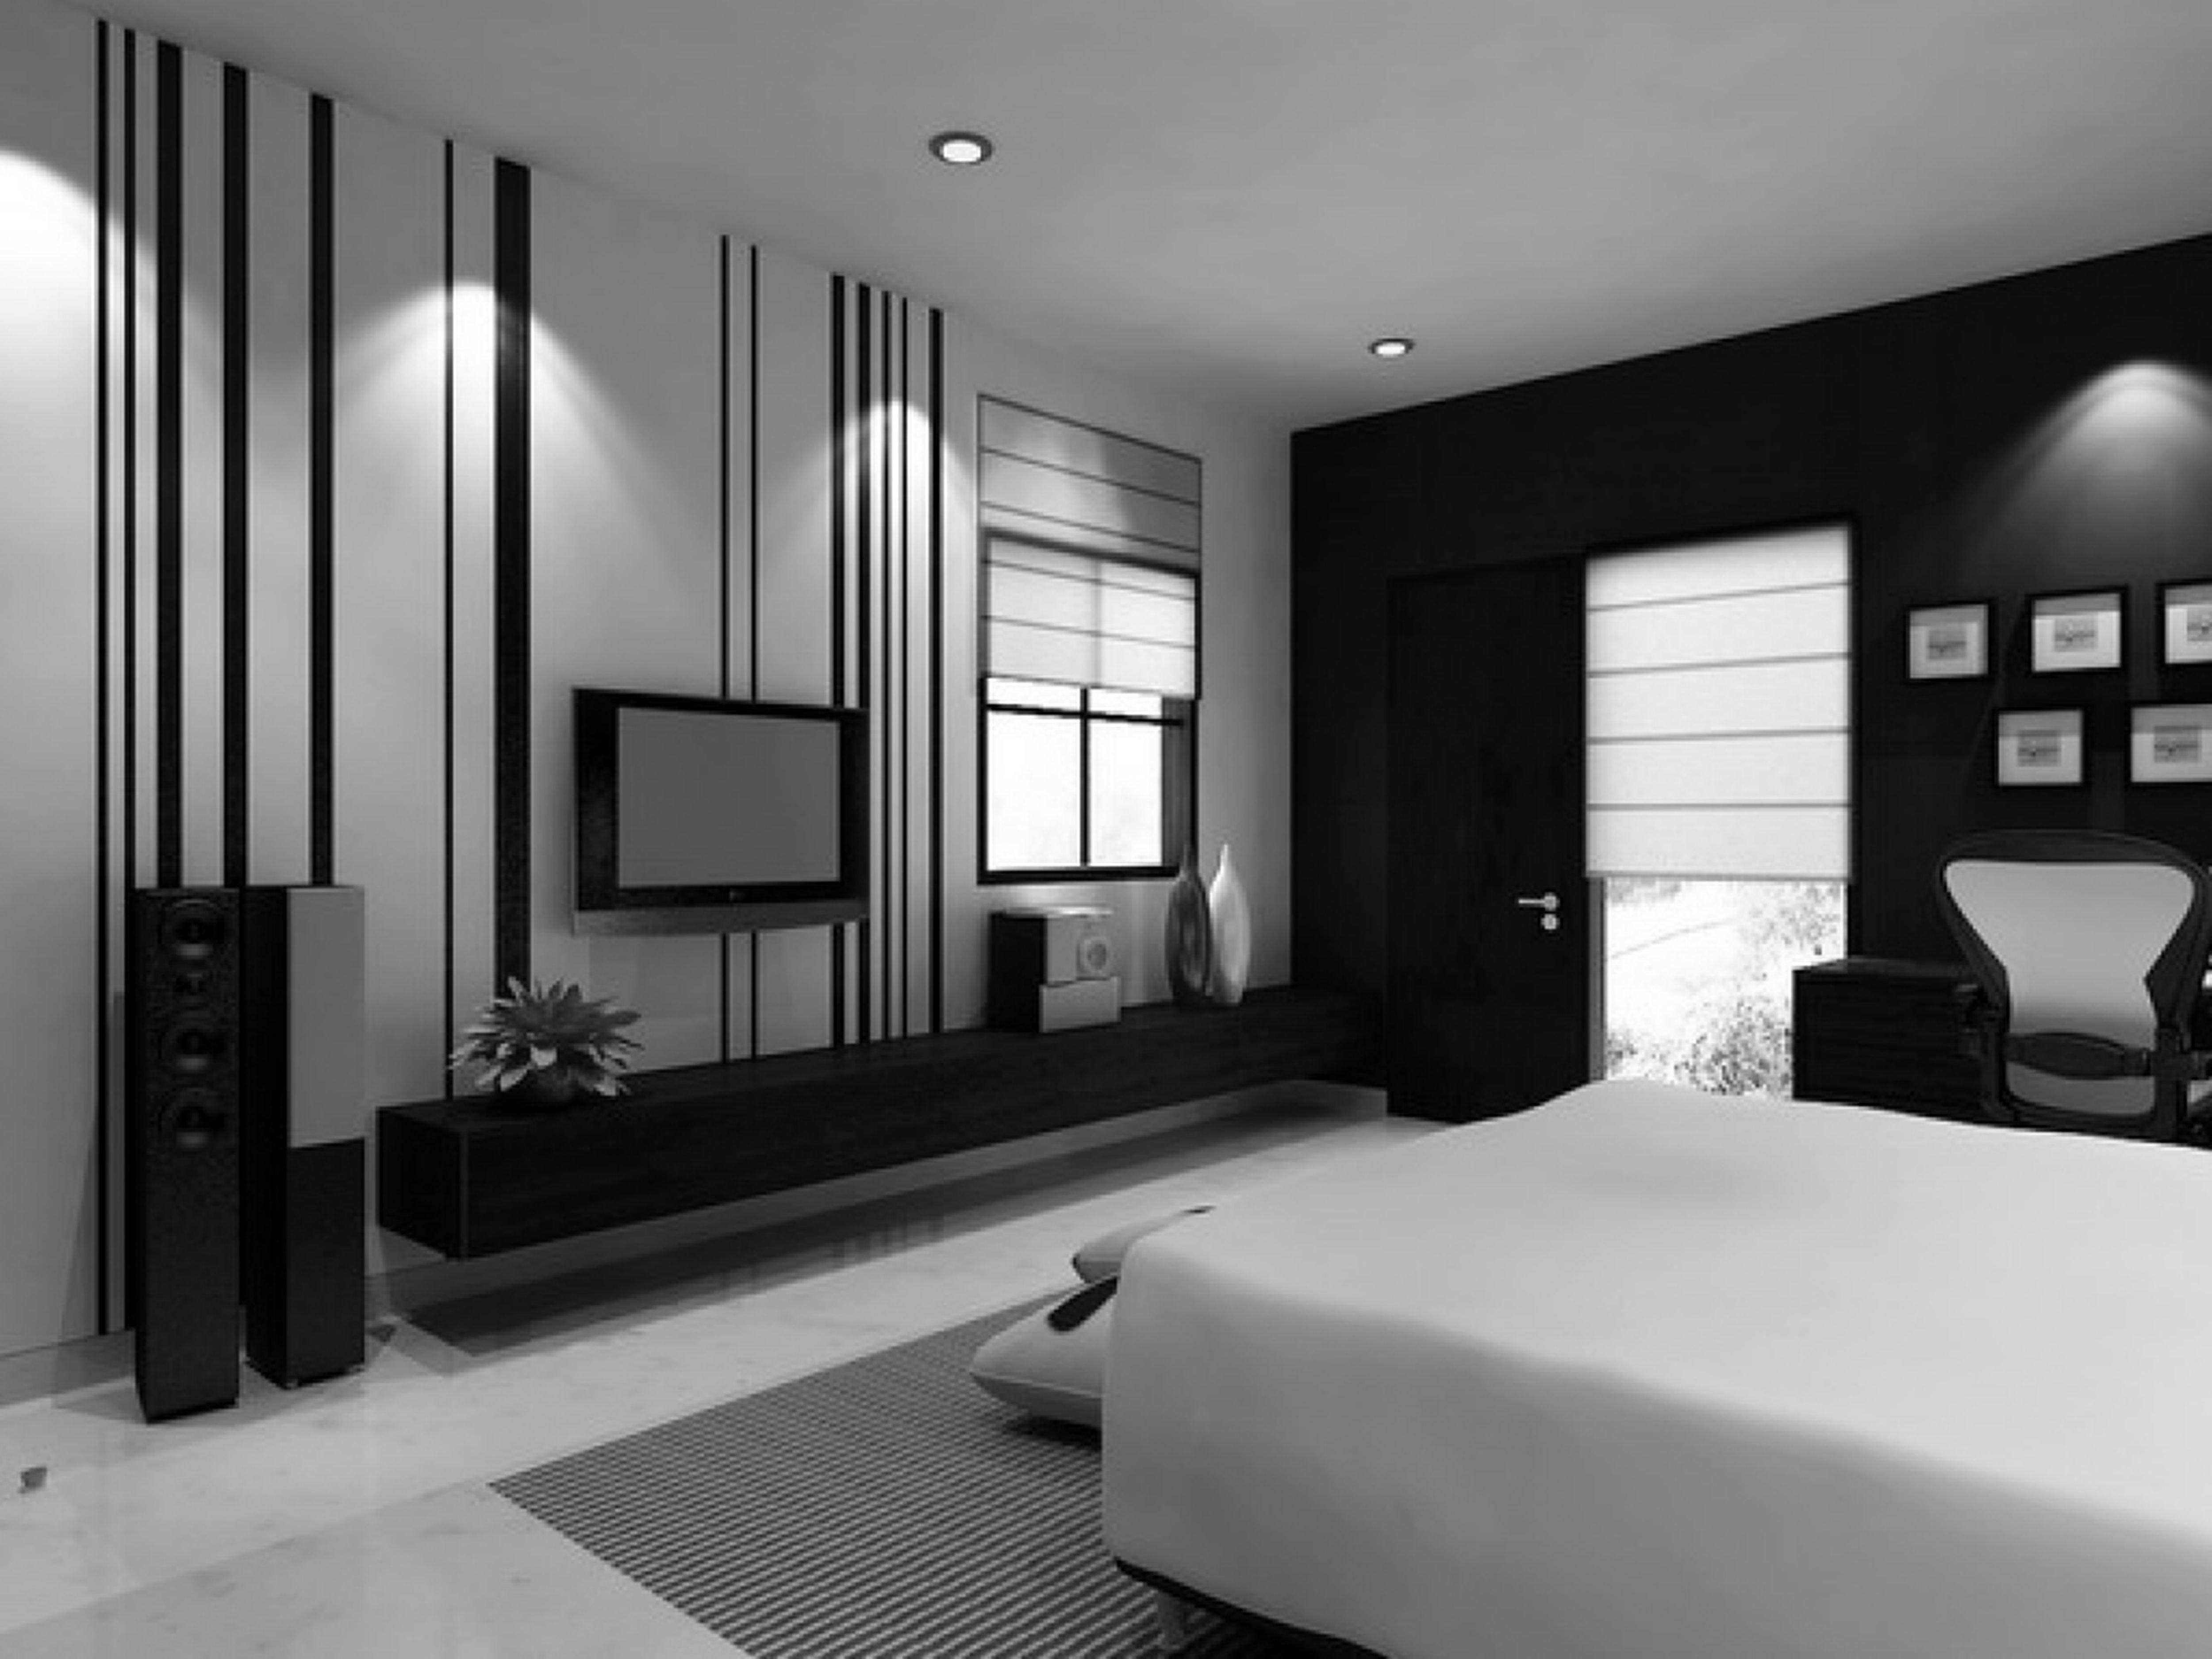 10 Wonderful Black And White Bedroom Ideas impressive black and white bedroom design about interior decor ideas 2020